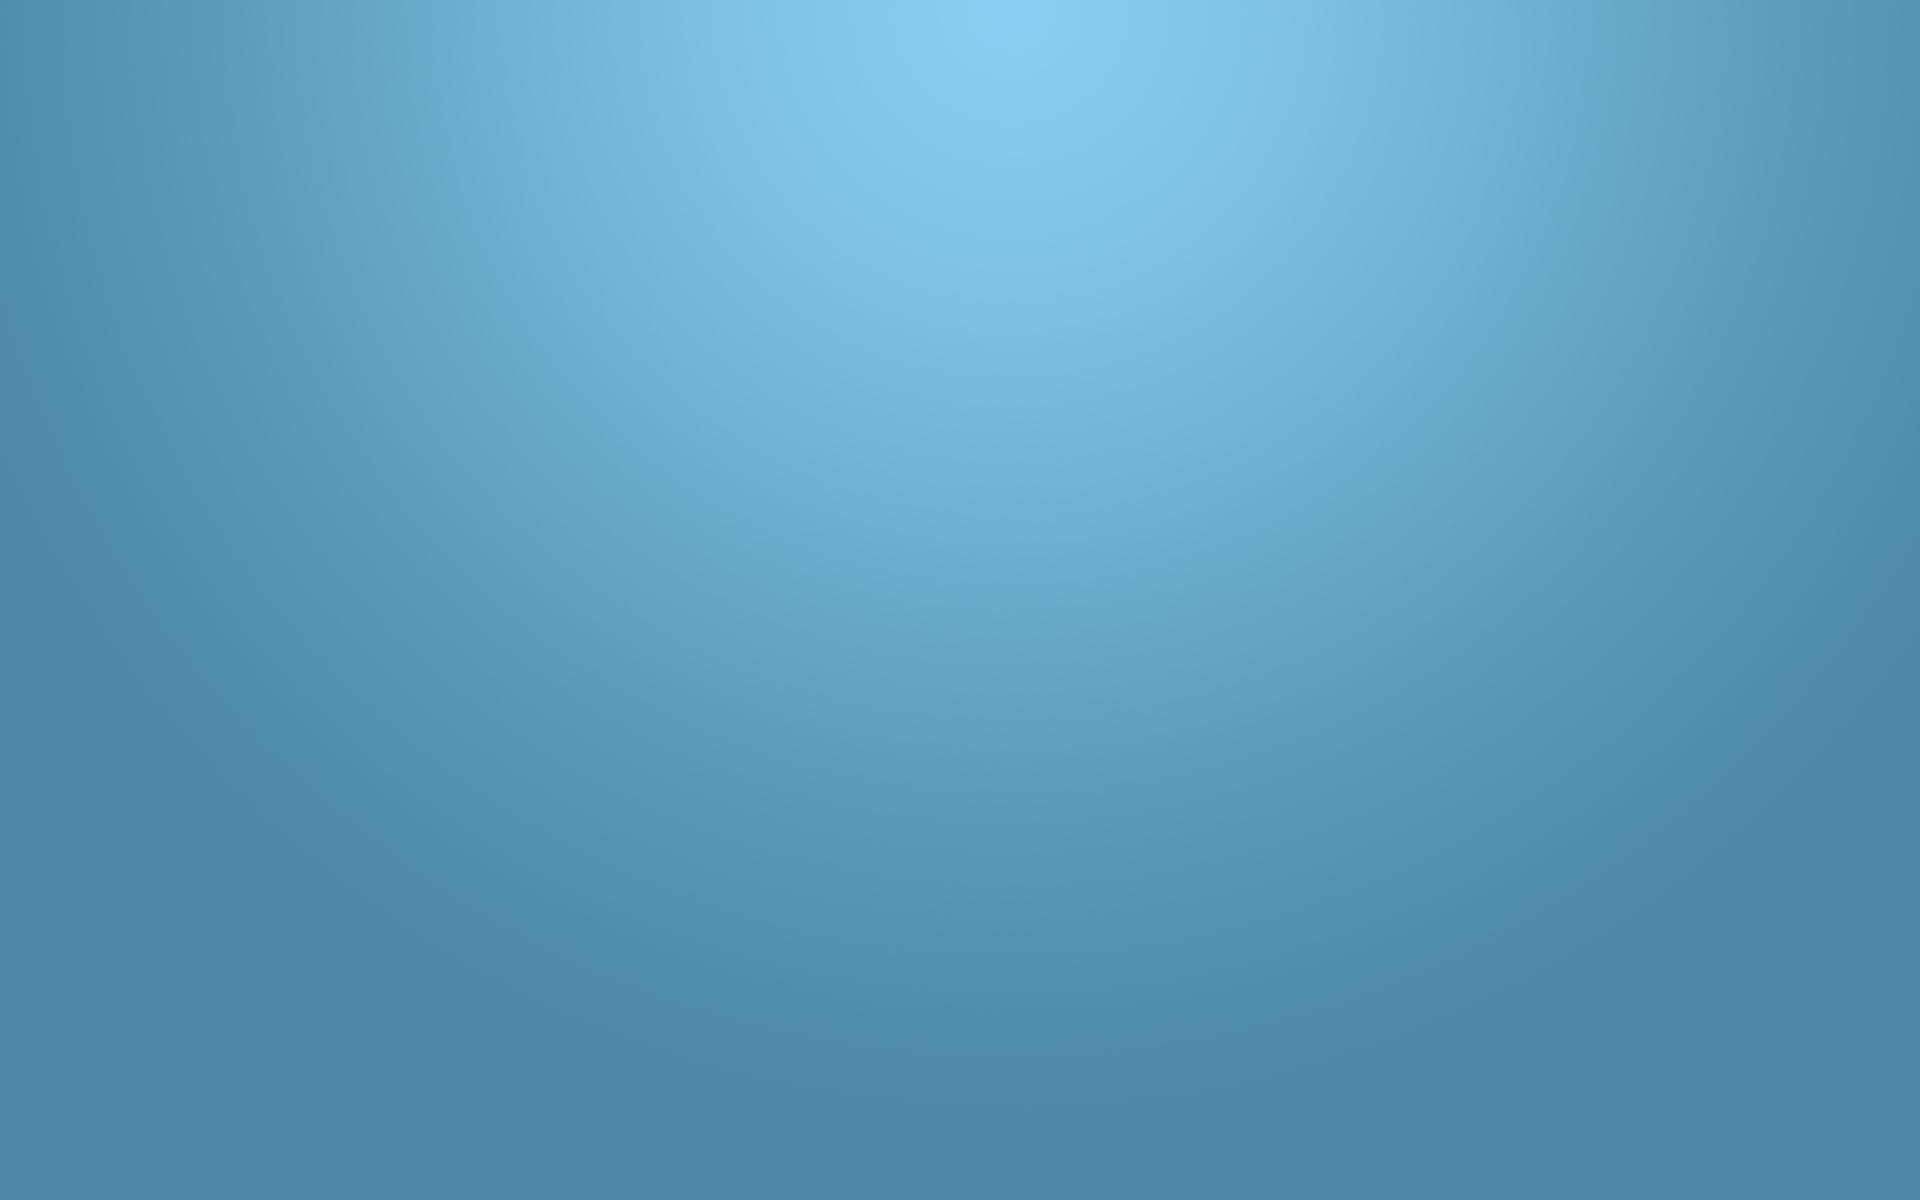 Blue Computer Background - WallpaperSafari